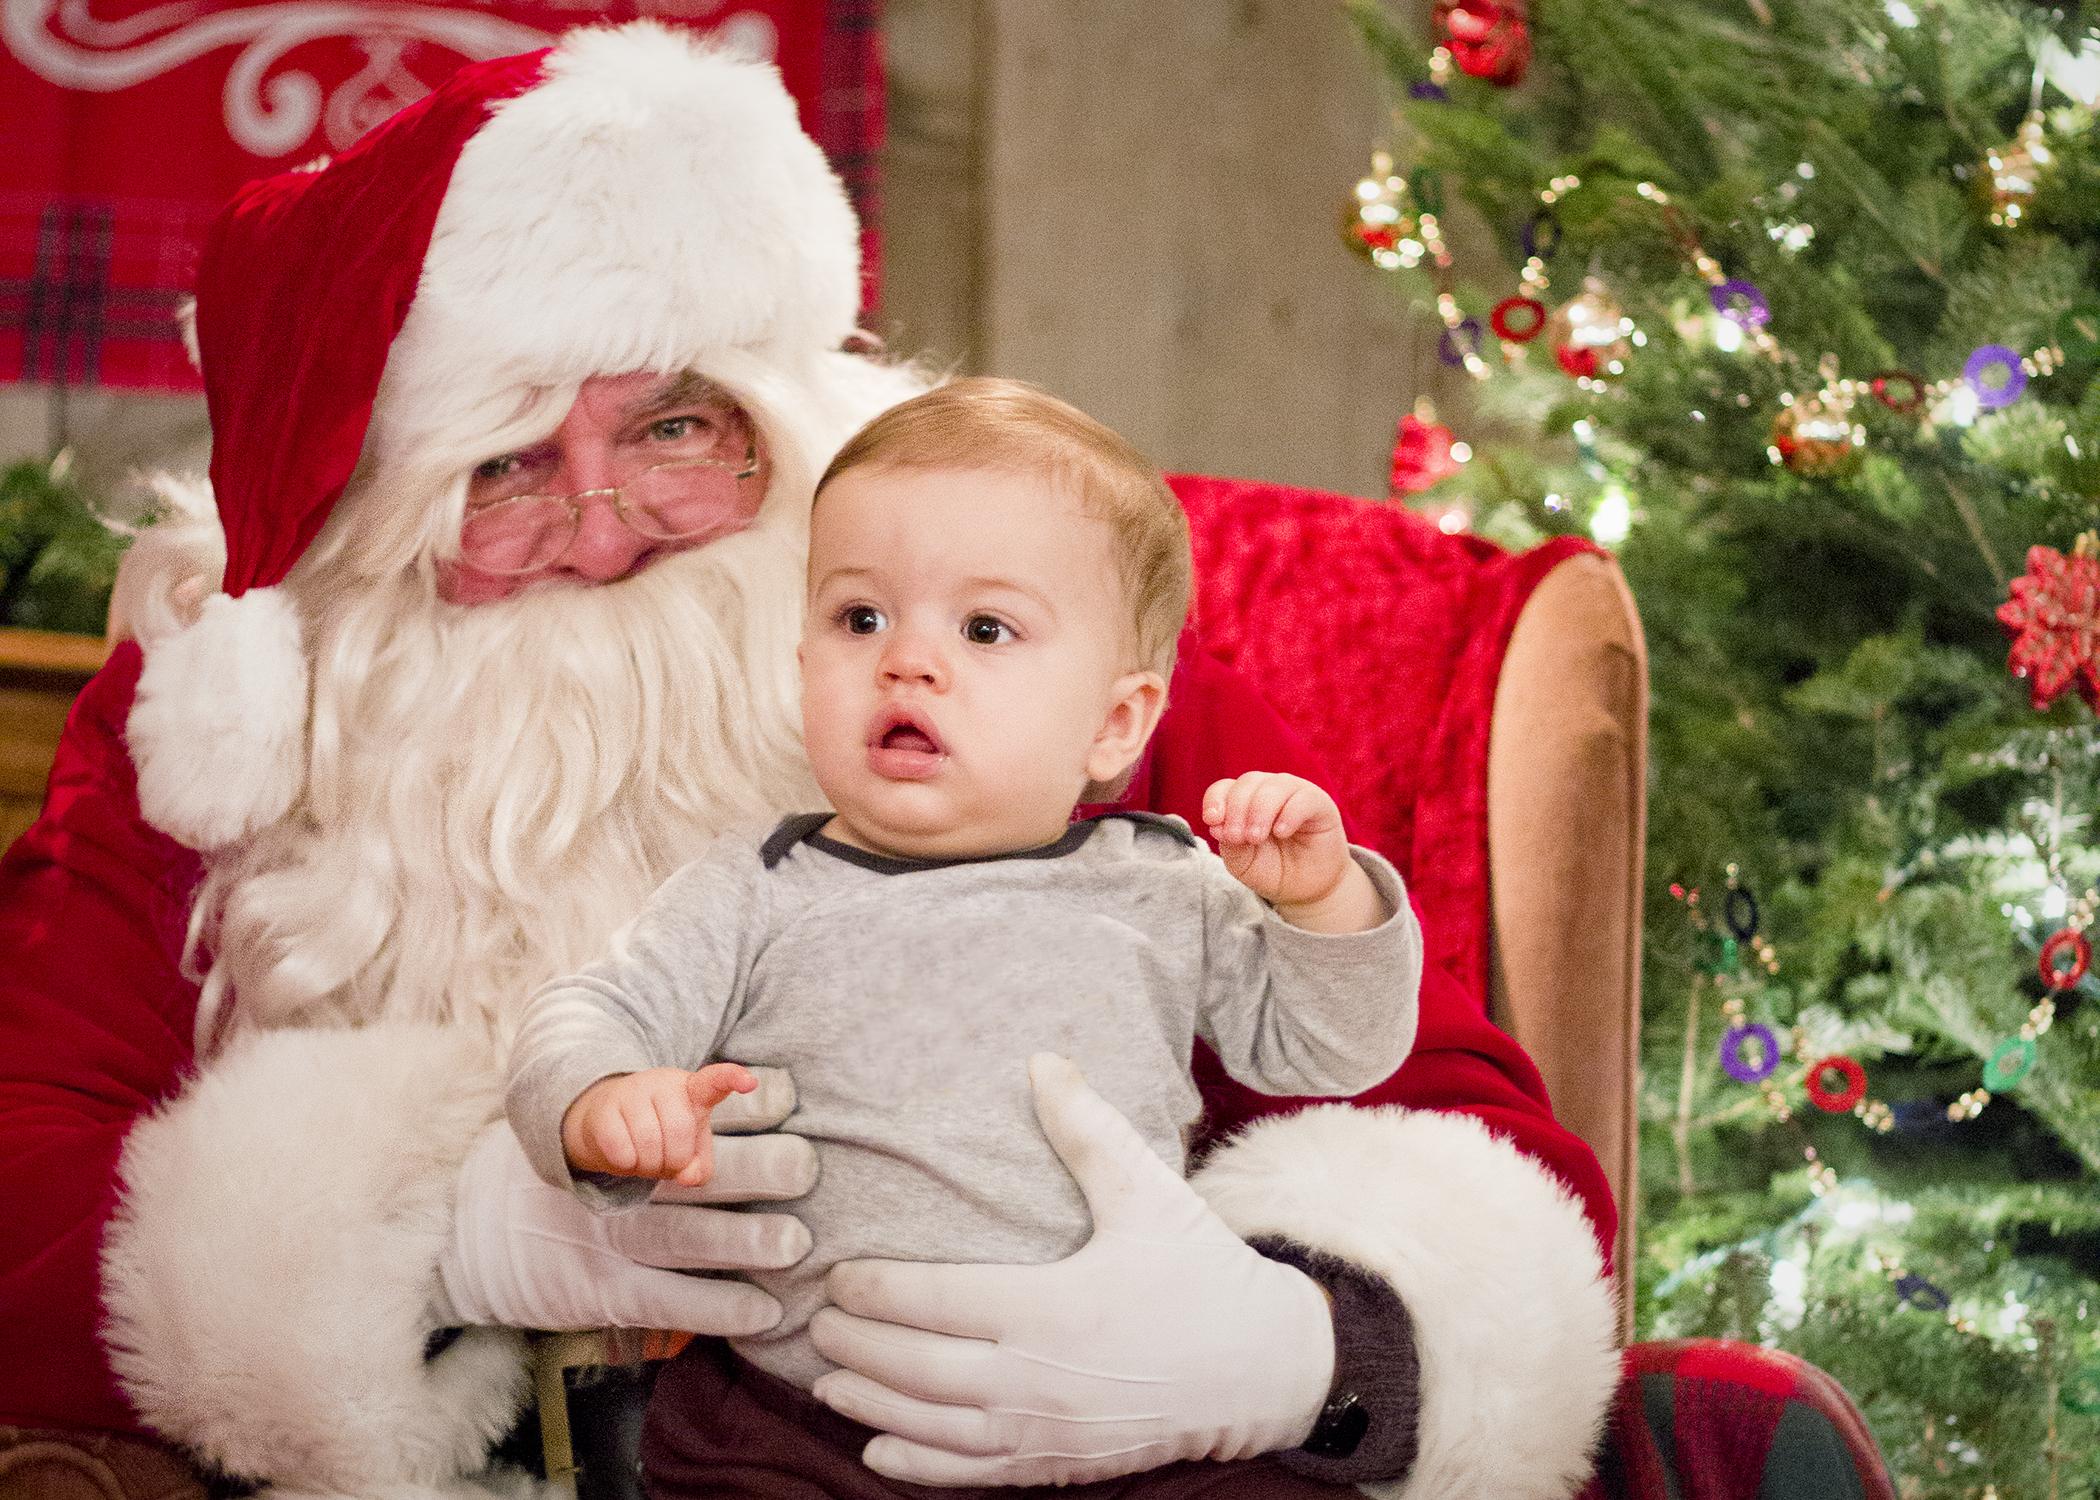 Brayden and Santa